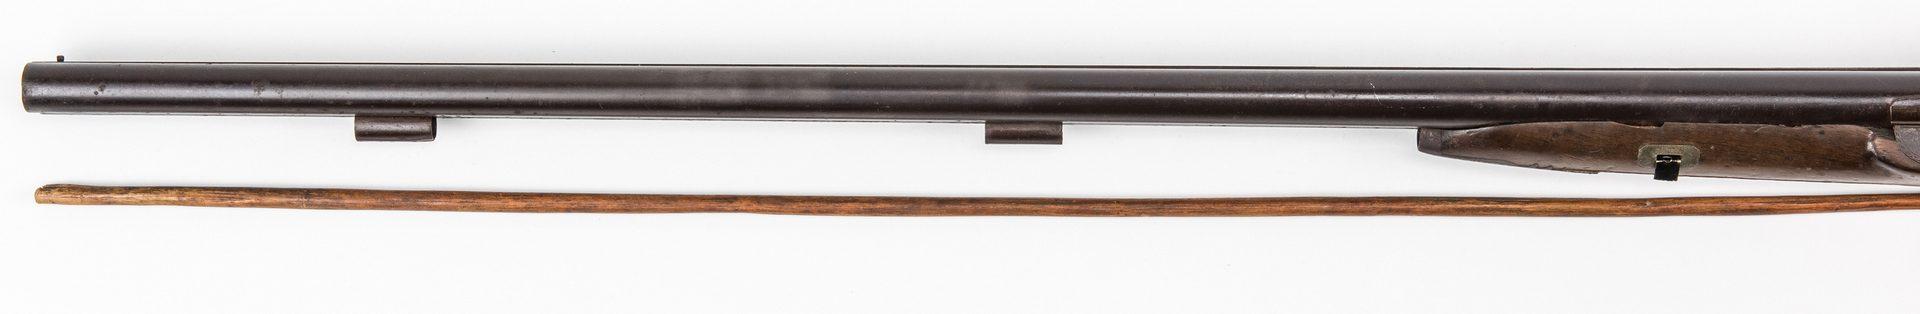 Lot 781: European Percussion Shotgun with Gold Animal Inlay, 12 gauge